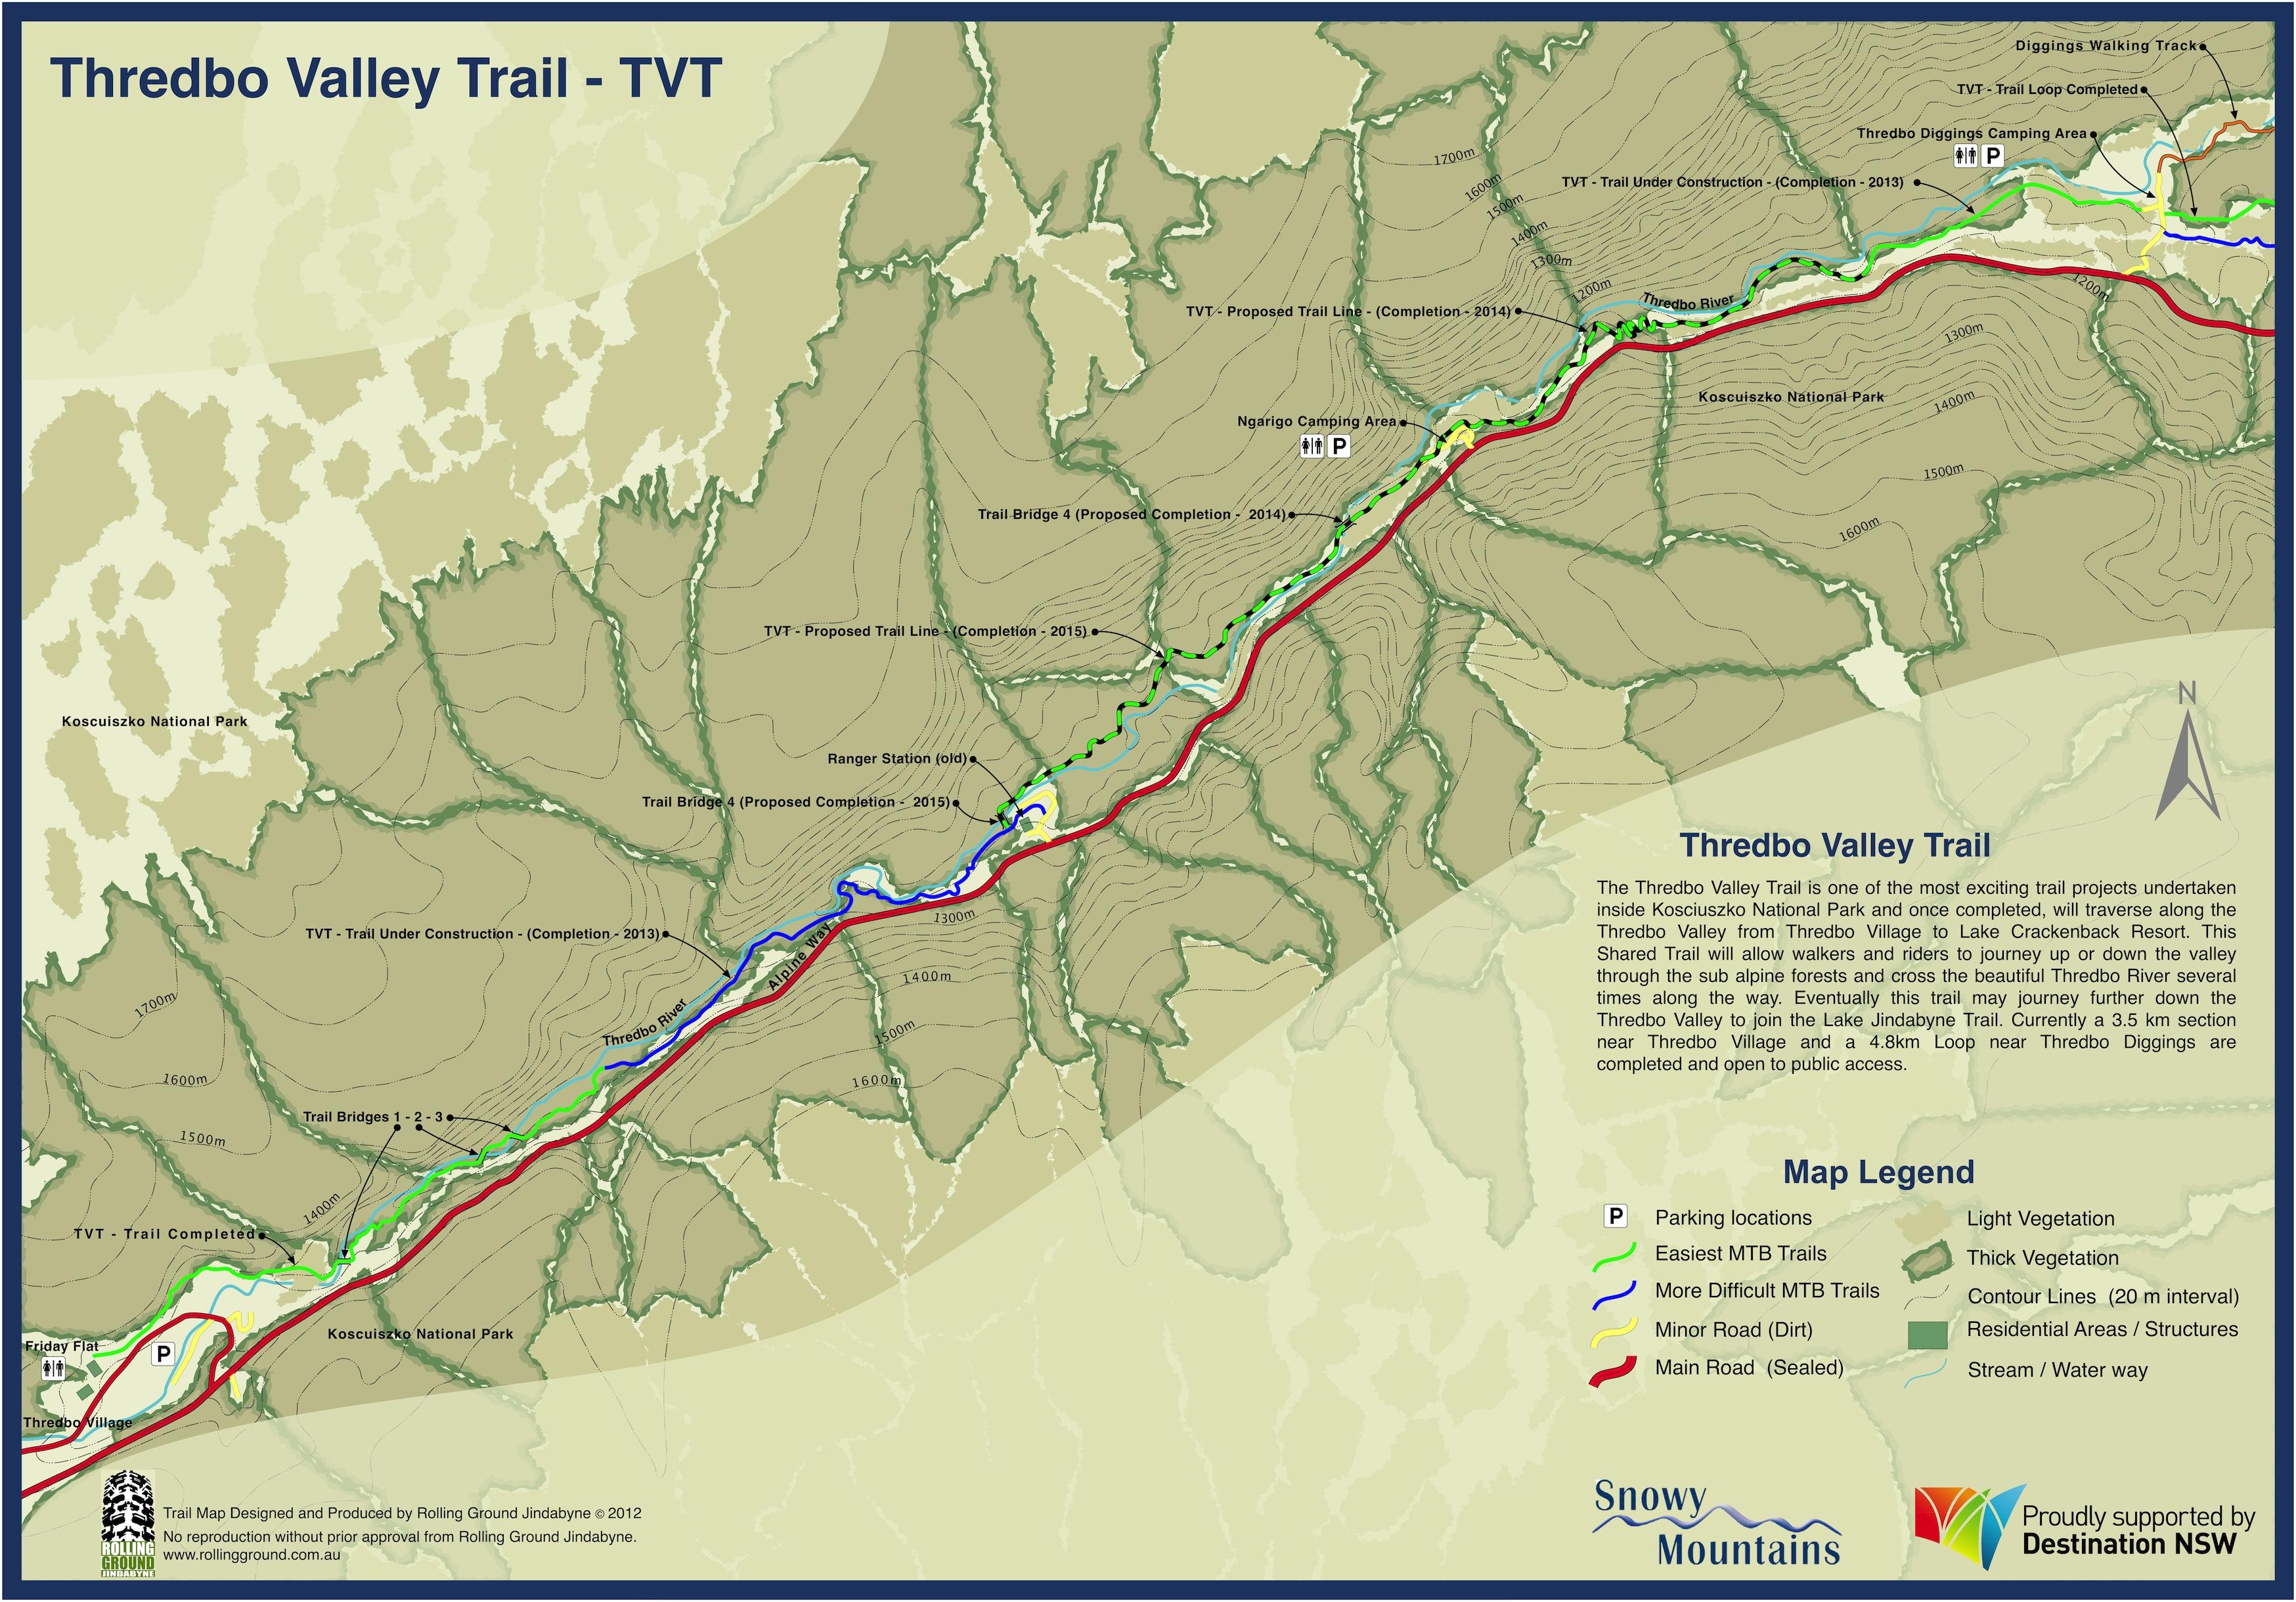 Thredbo Valley Trail Map